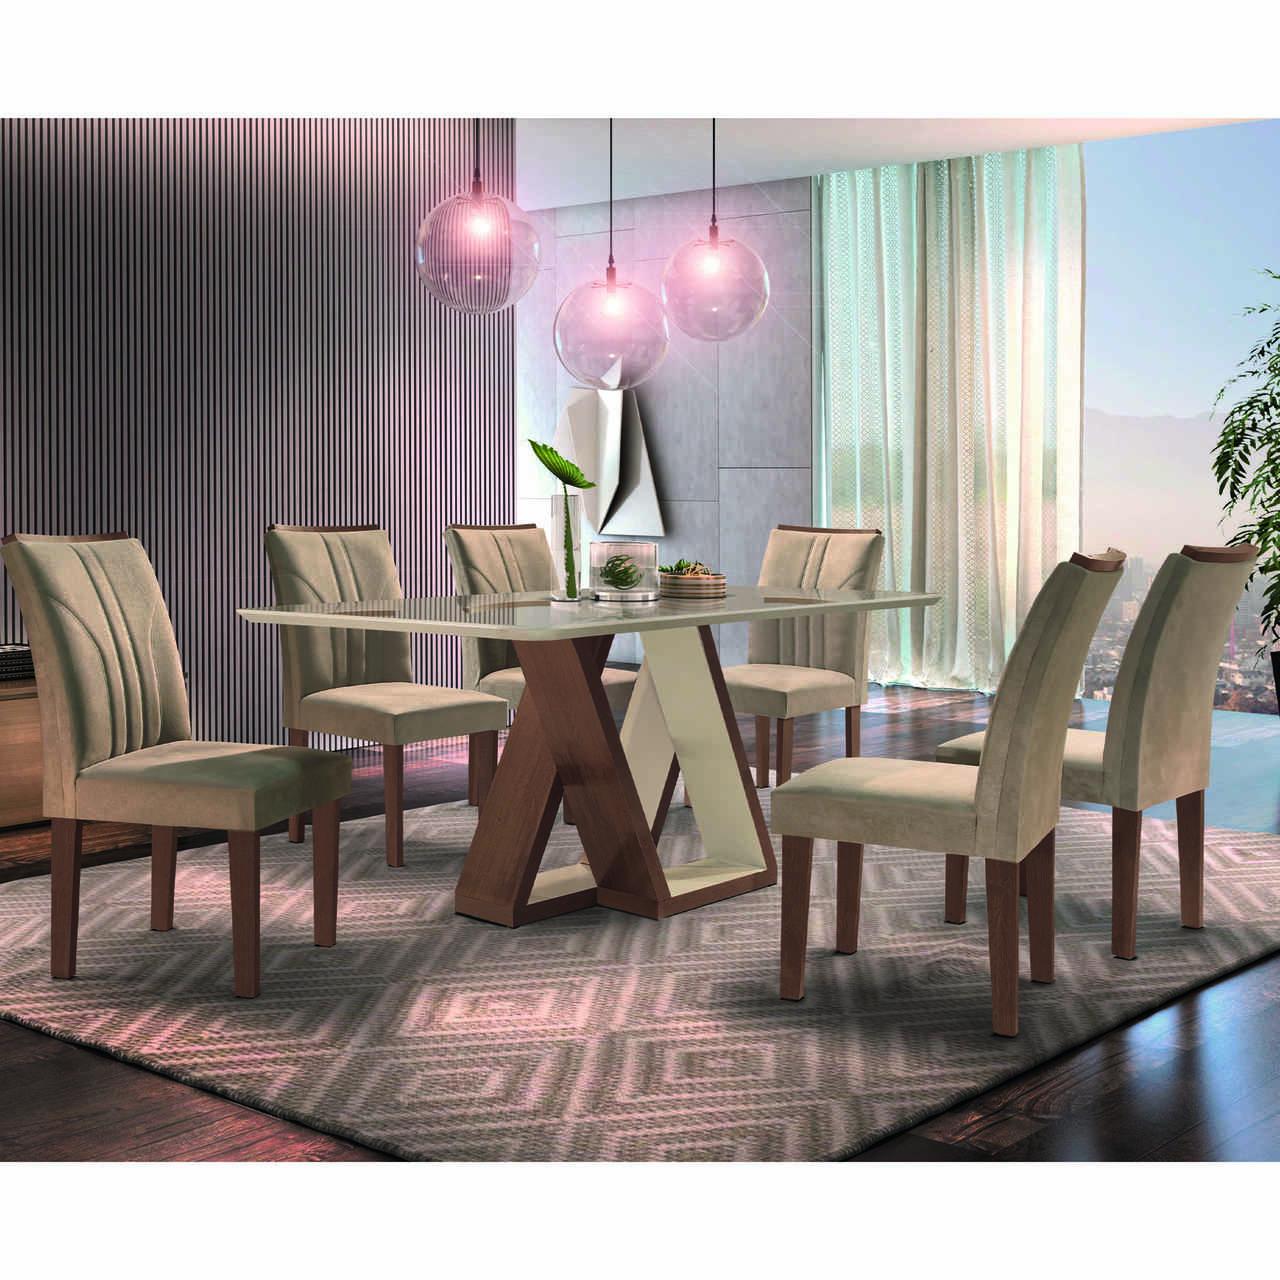 Sala de Jantar Belle Tampo Smart Plus com 6 Cadeiras Belle  Cel Móveis